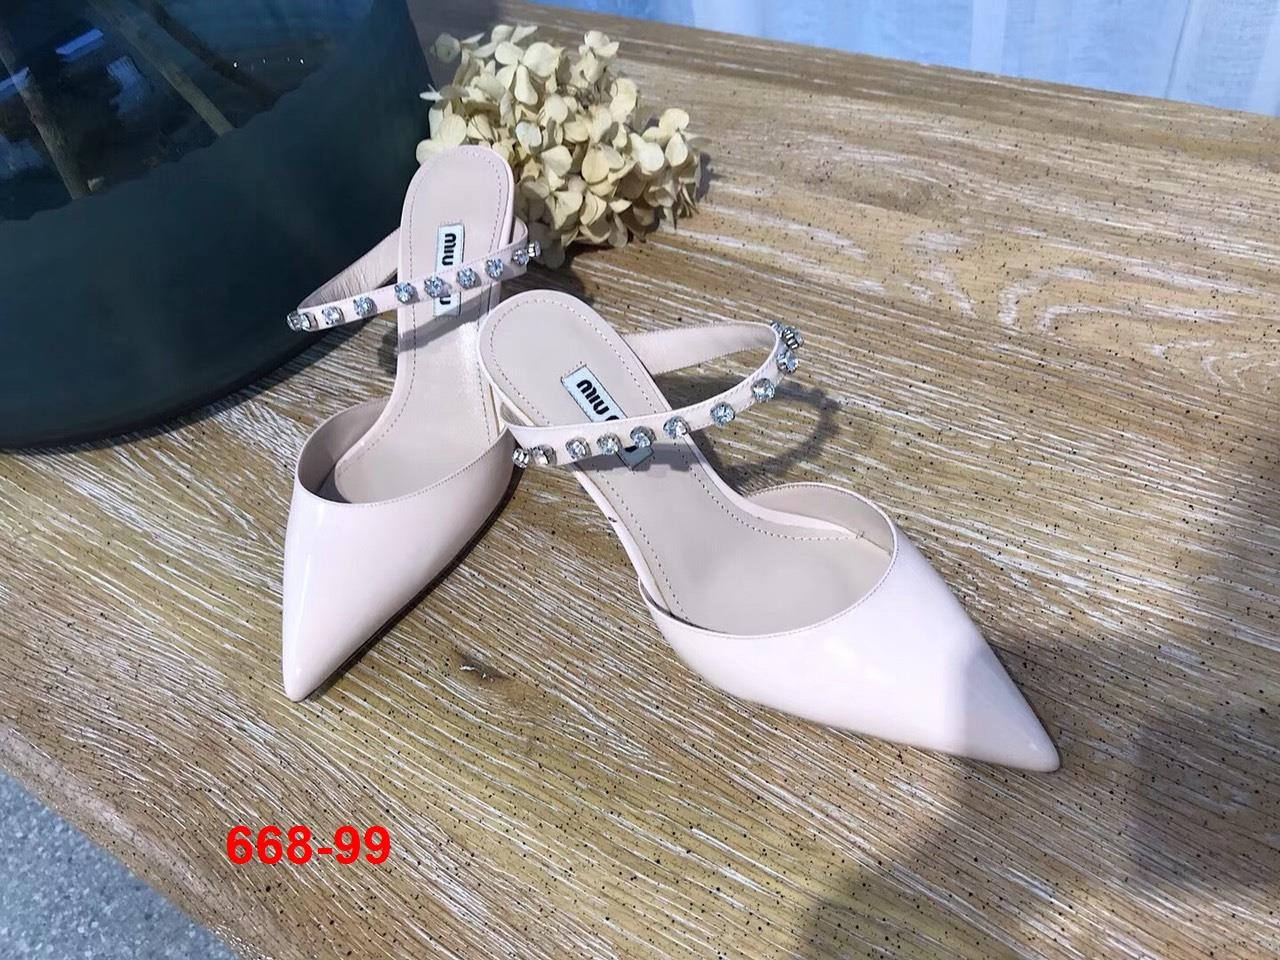 668-99 Miu Miu sandal cao 6cm siêu cấp